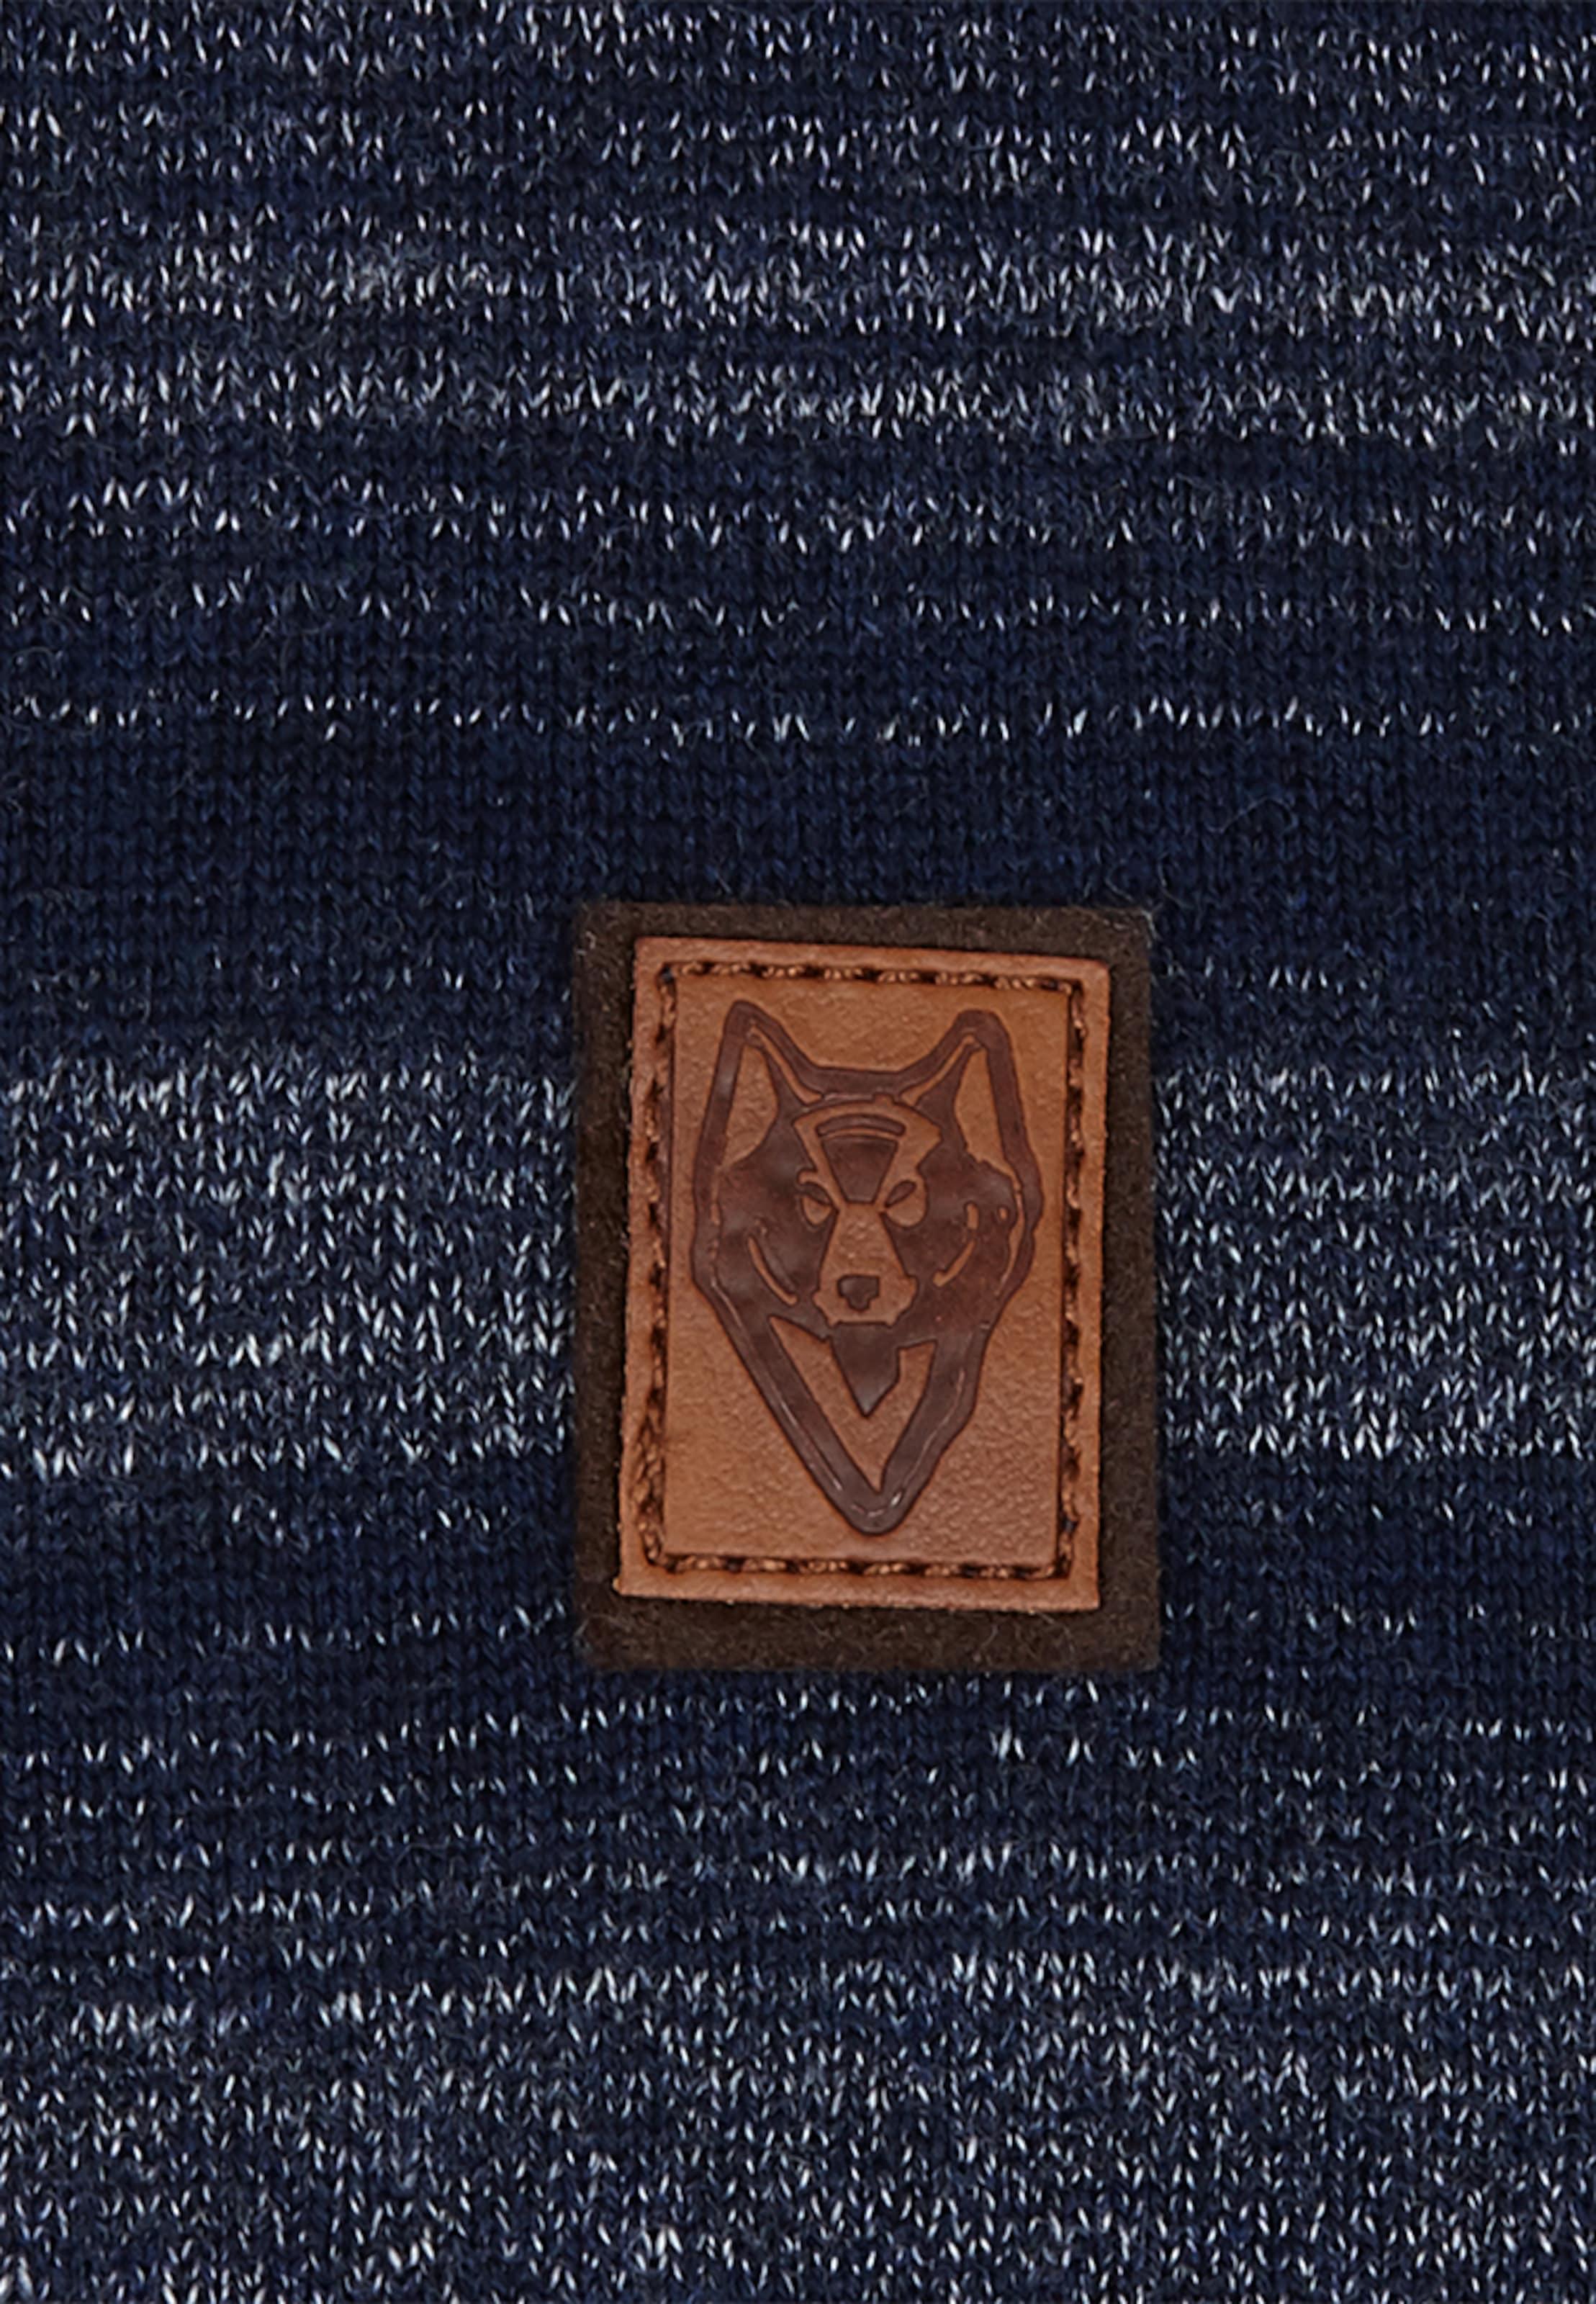 Verkauf Größten Lieferanten Geringster Preis naketano Male Knit 'MDMA macht aha' Original-Verkauf Online Rabatt Sast EXnCb6